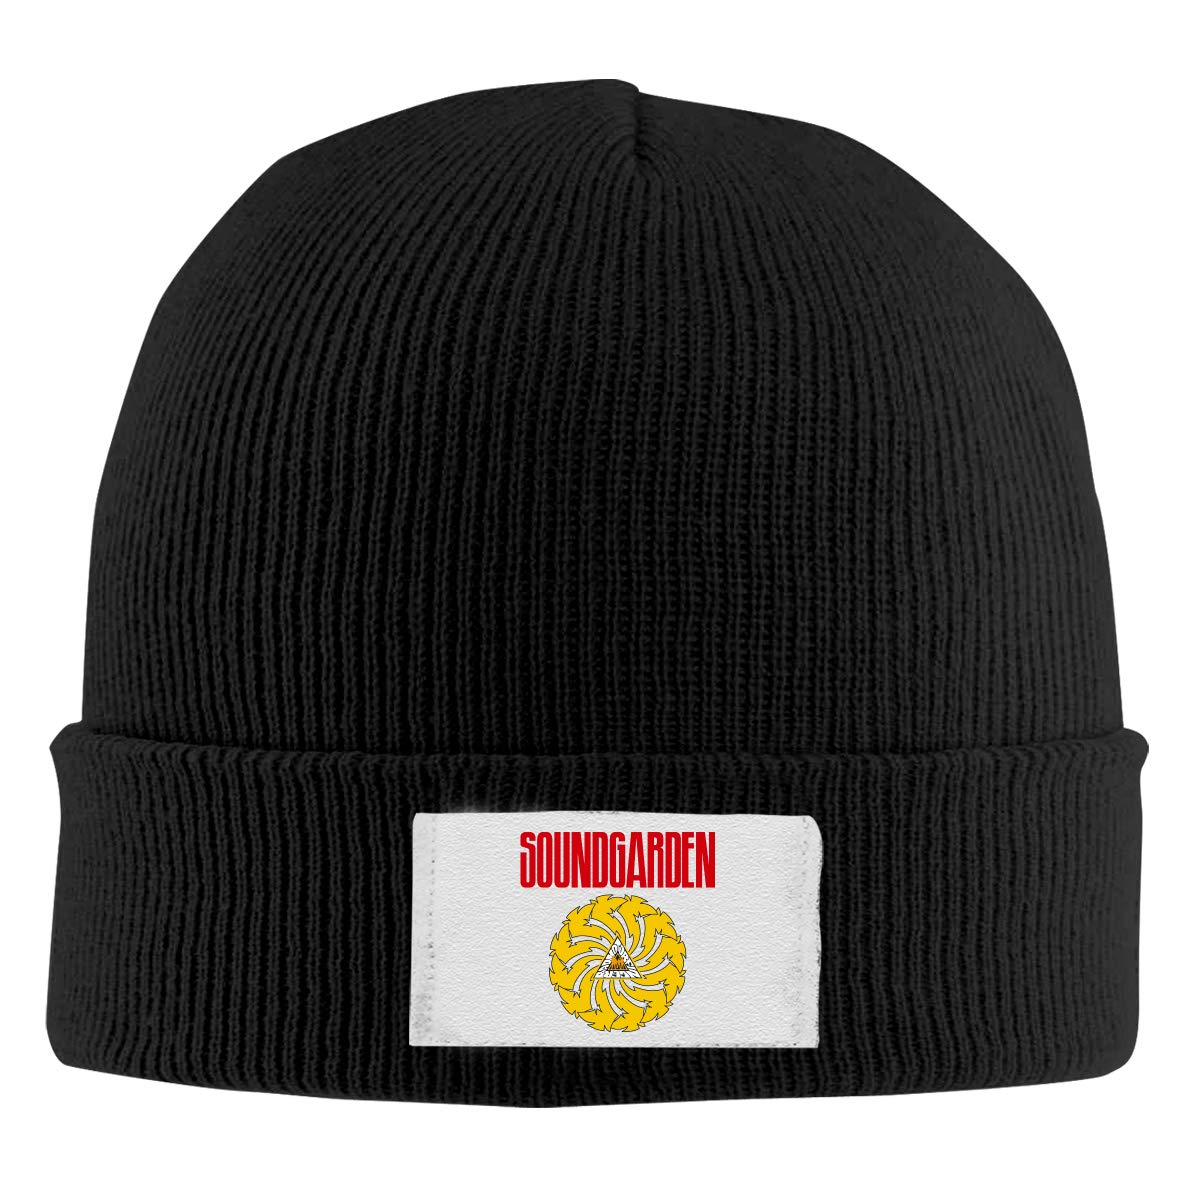 Unisex Stylish Slouch Beanie Hats Black Soundgarden Logo Top Level Beanie Men Women